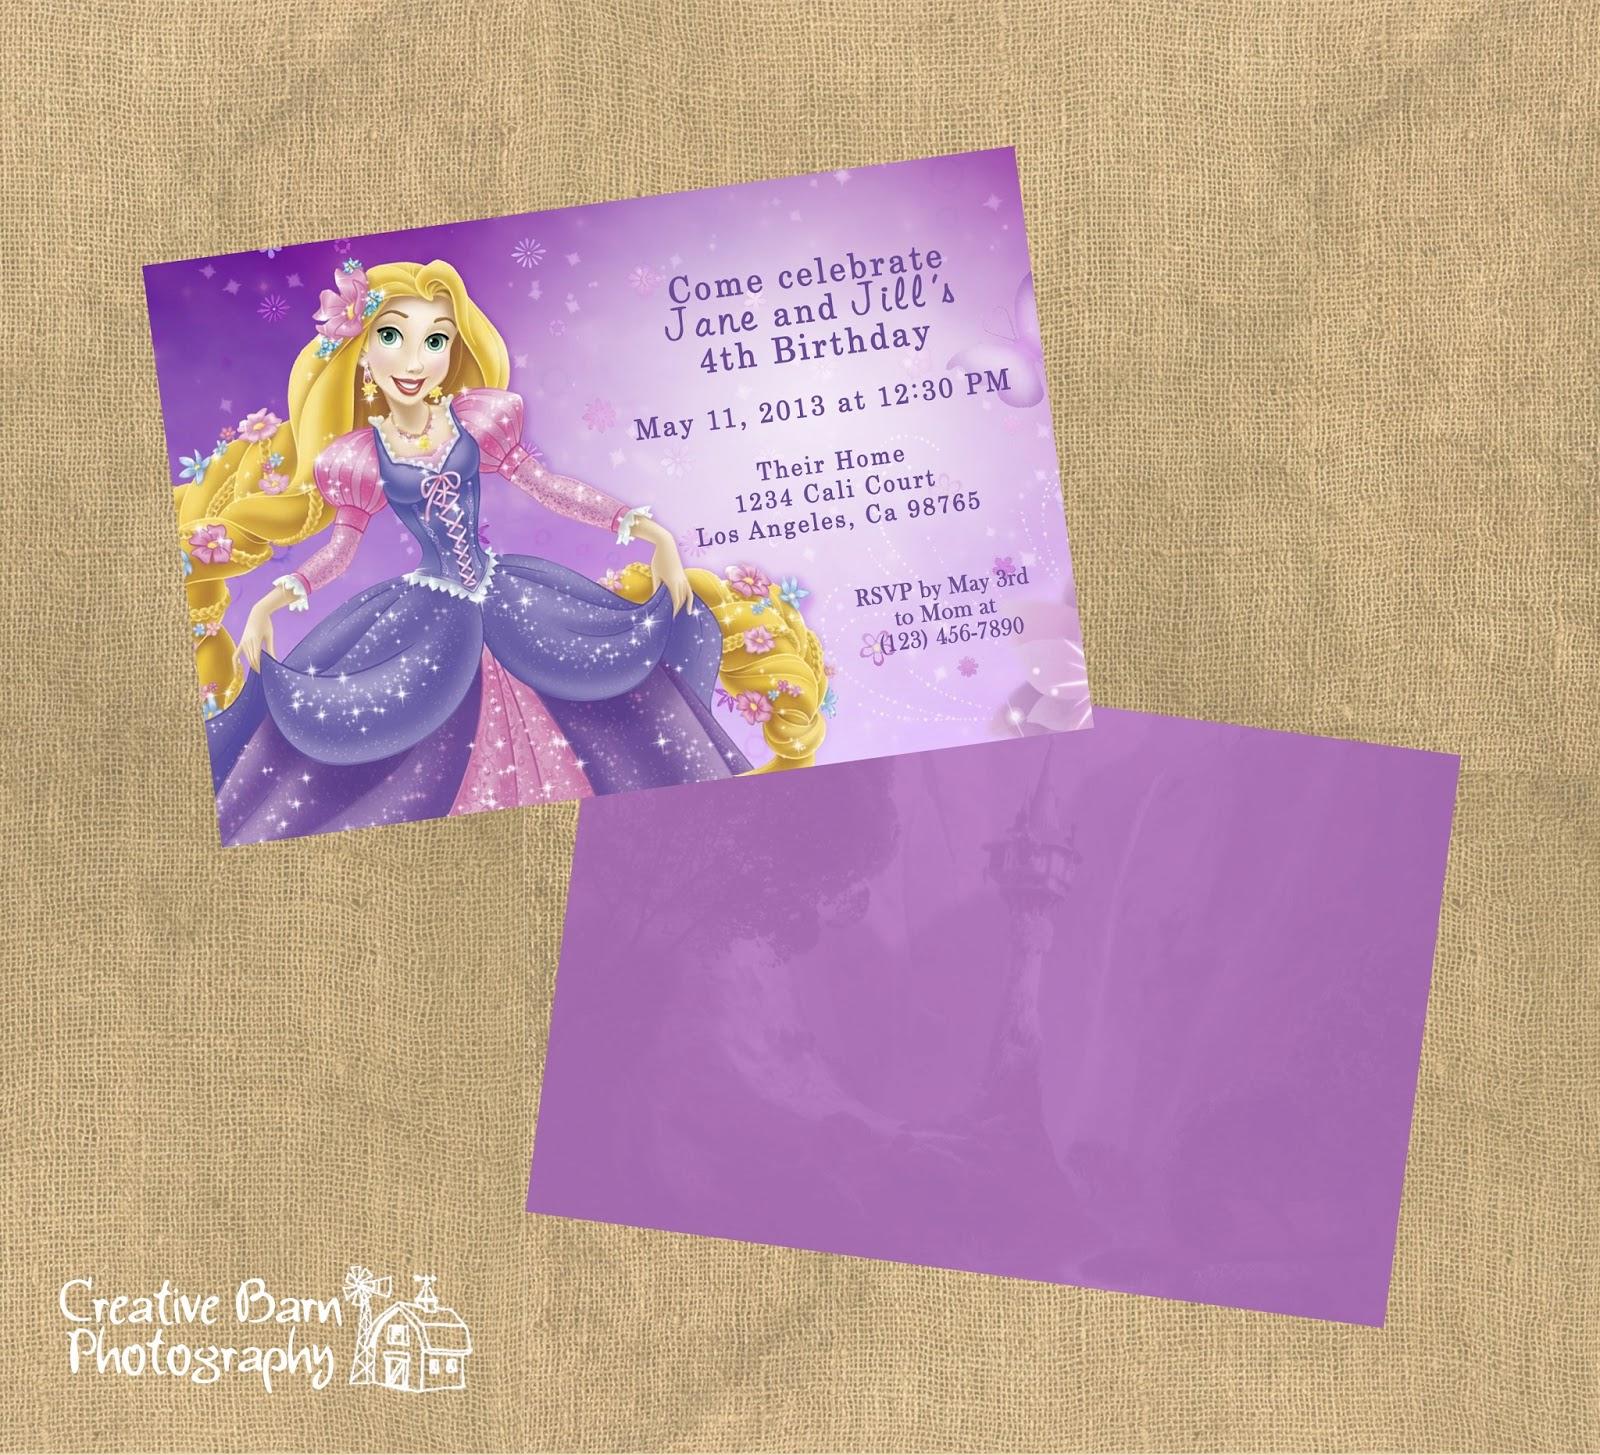 Creative Barn: Tangled Birthday Invitation